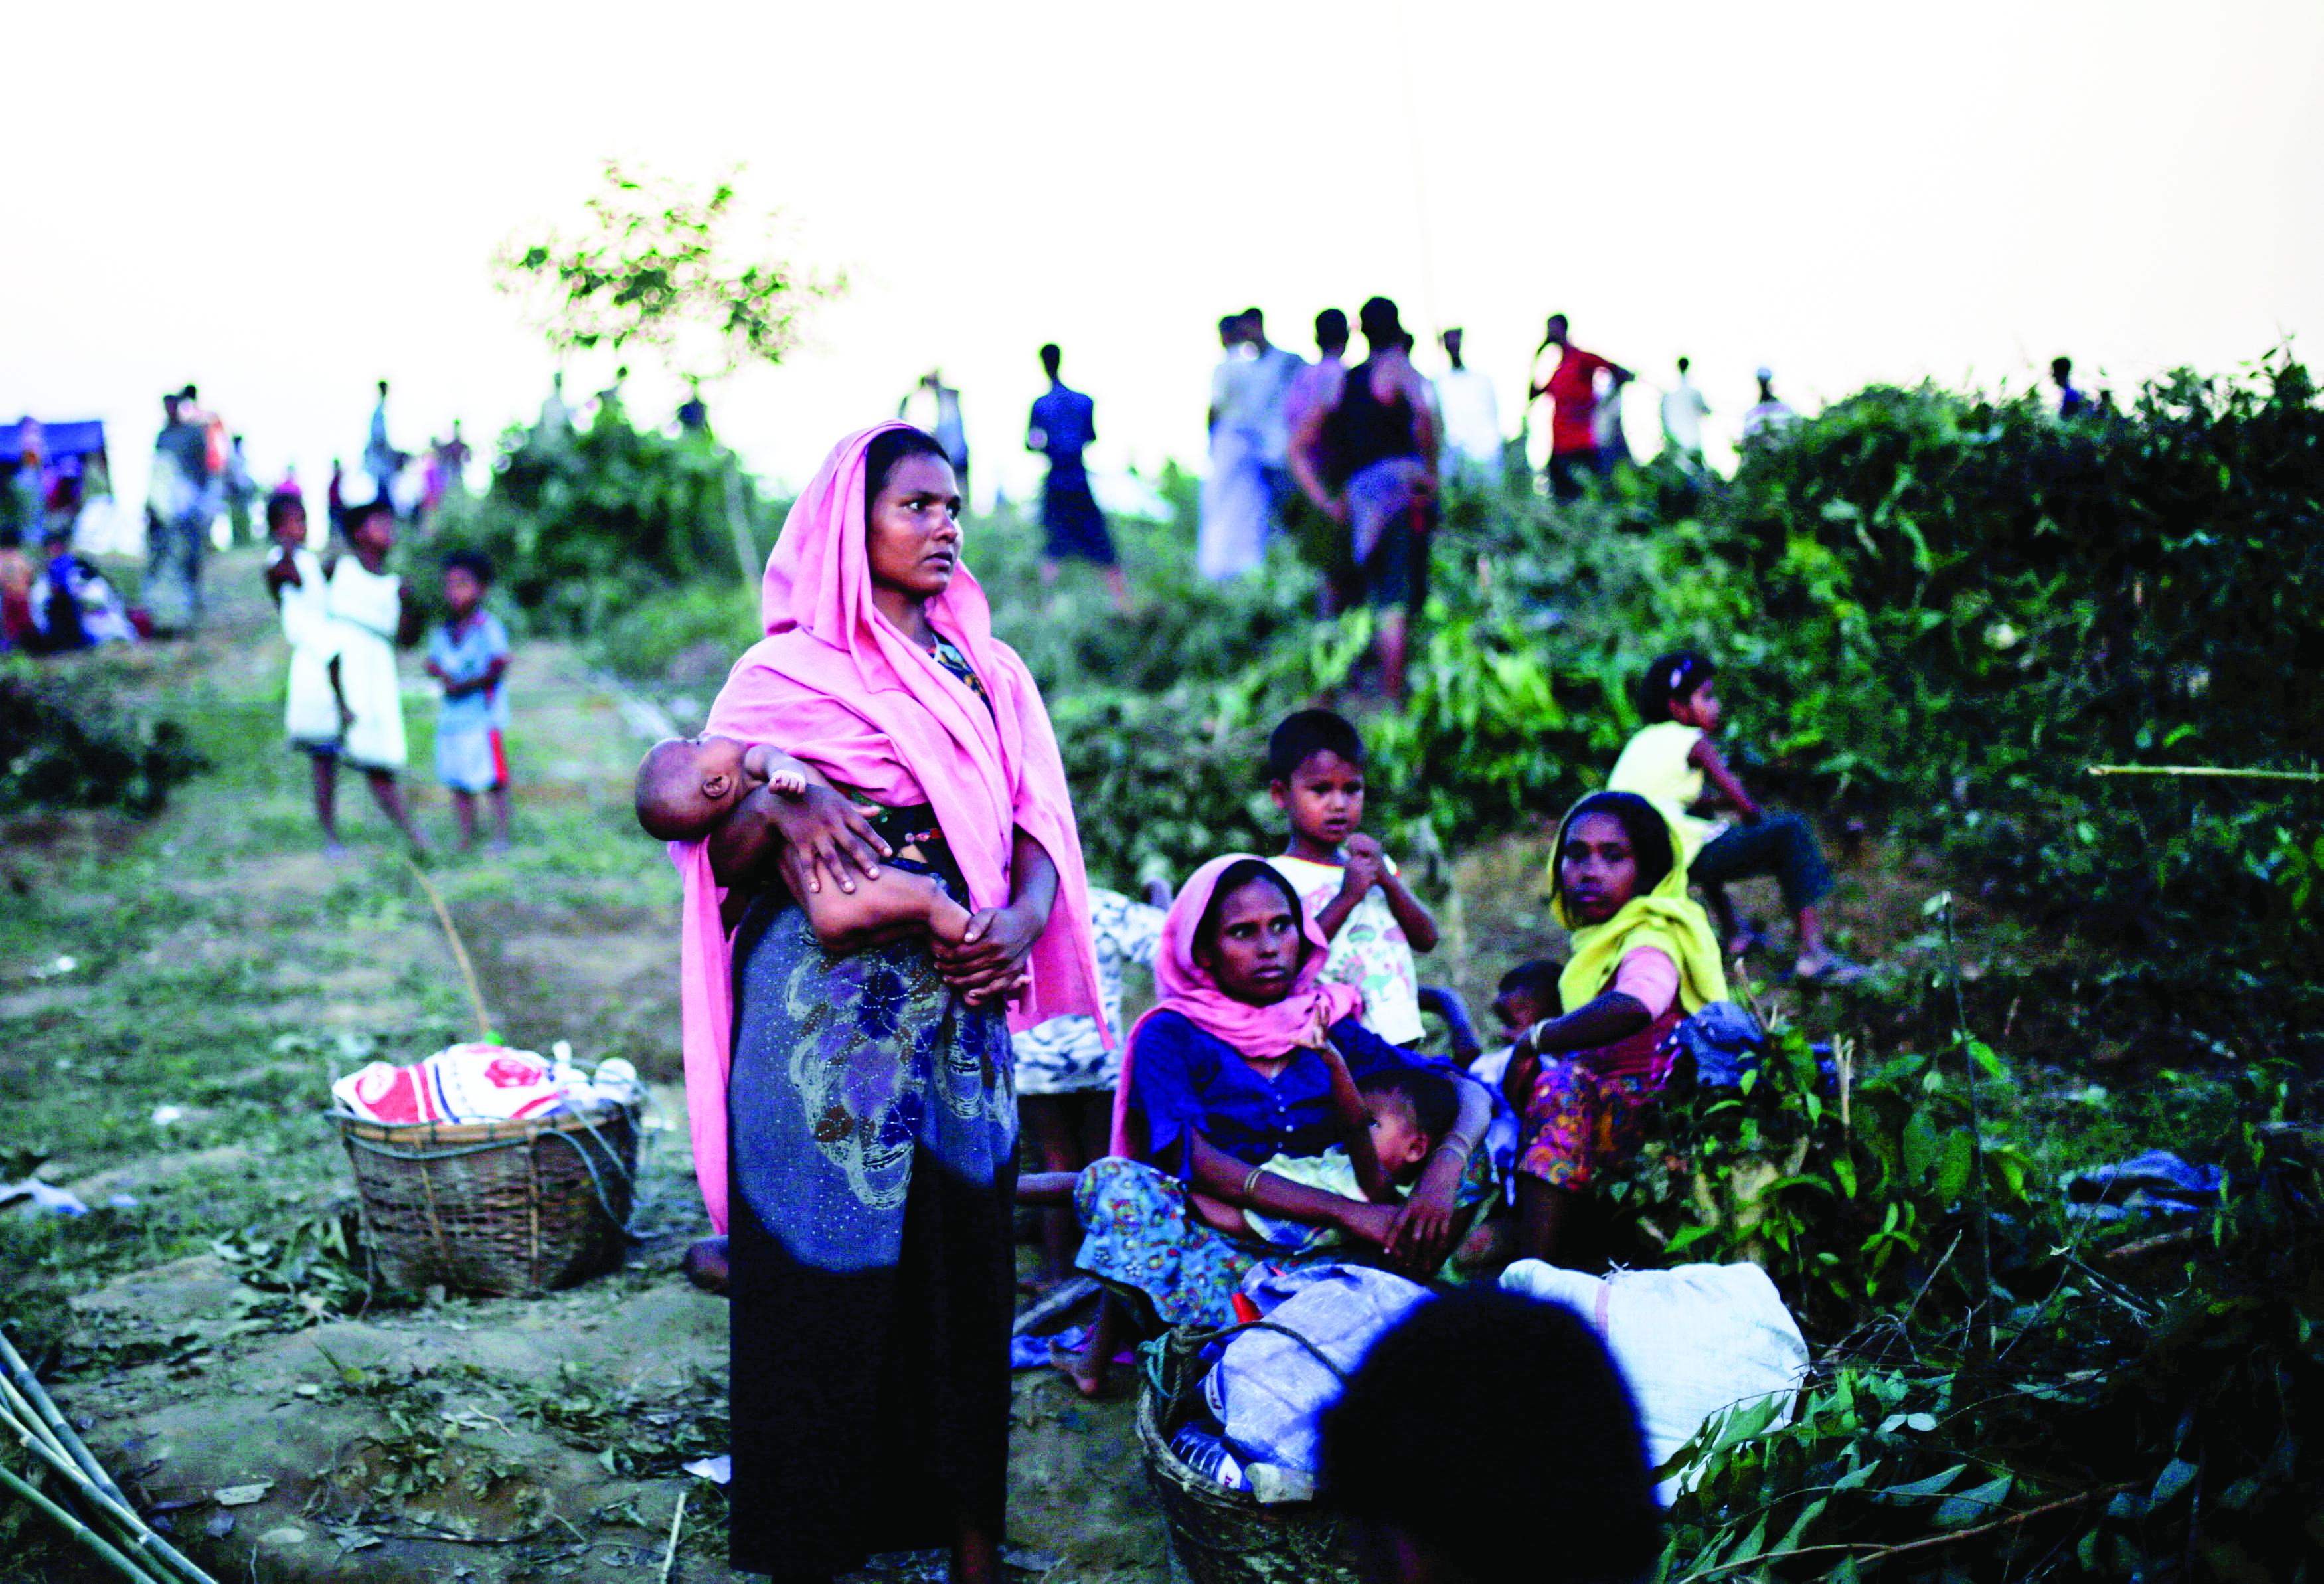 Bangladesh warns Myanmar over border amid Rohingya refugee crisis